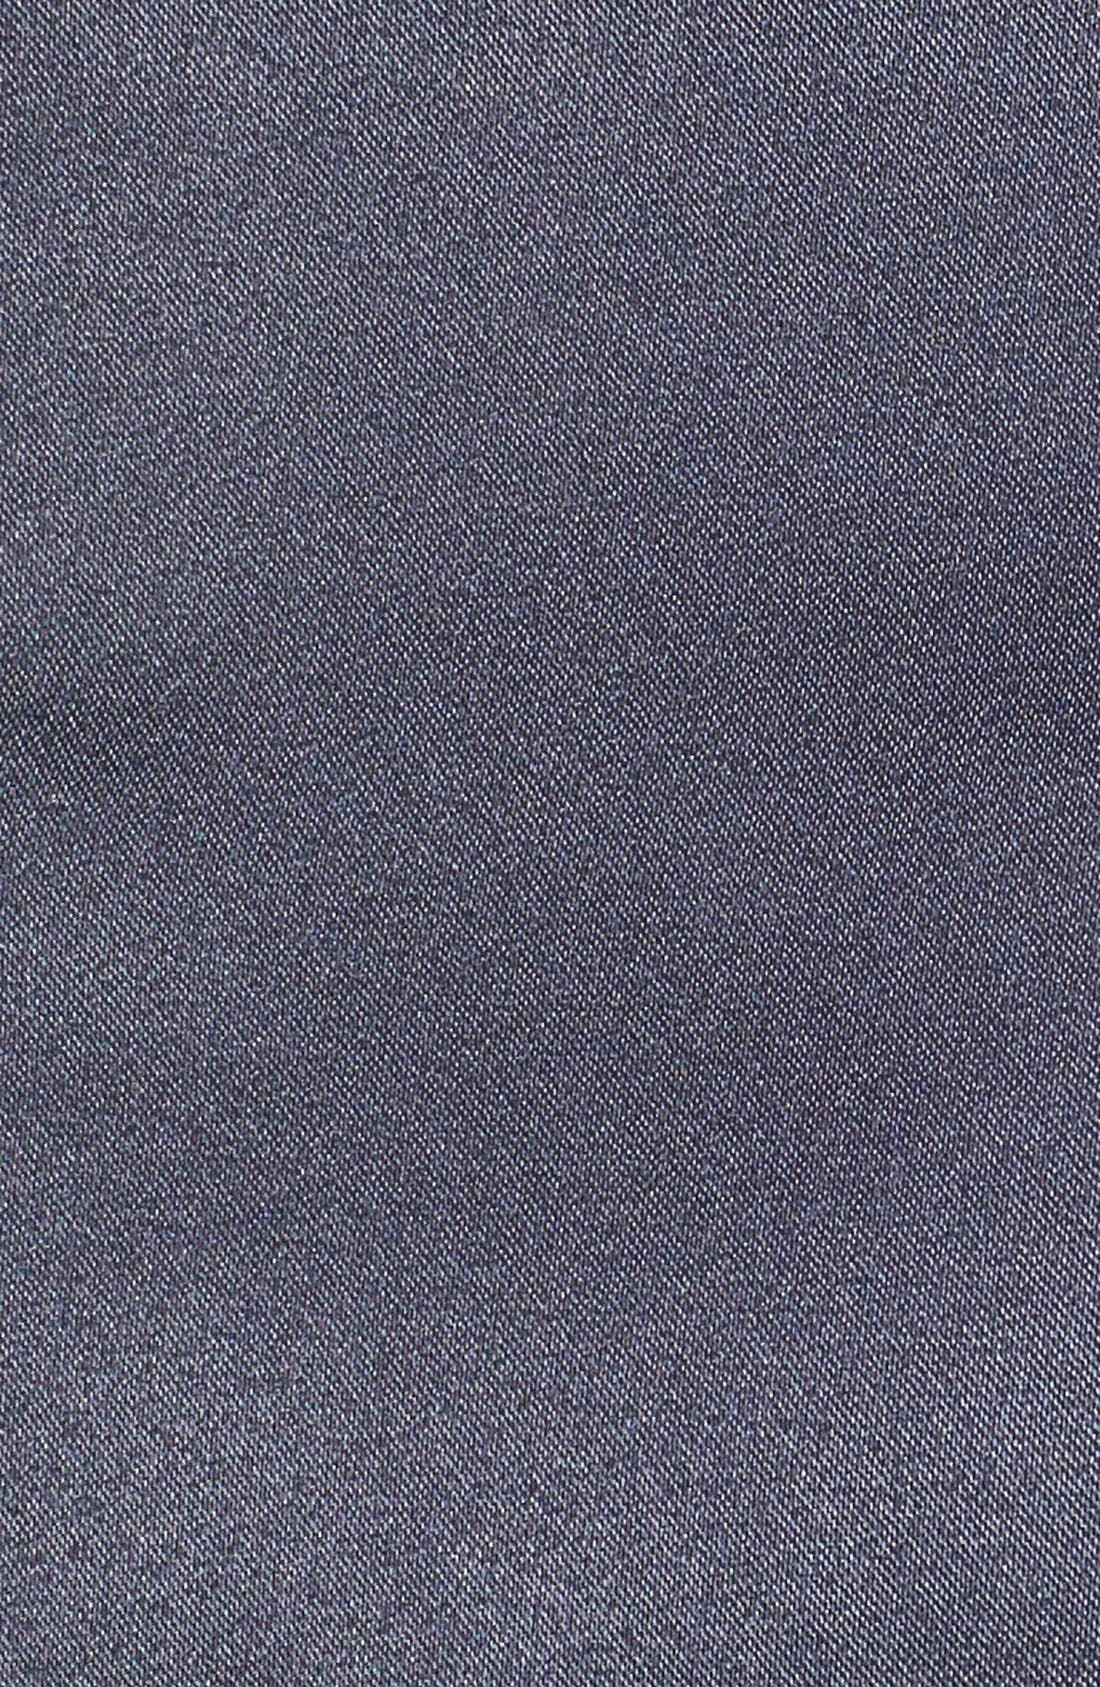 High Waist Satin Shorts,                             Alternate thumbnail 3, color,                             410